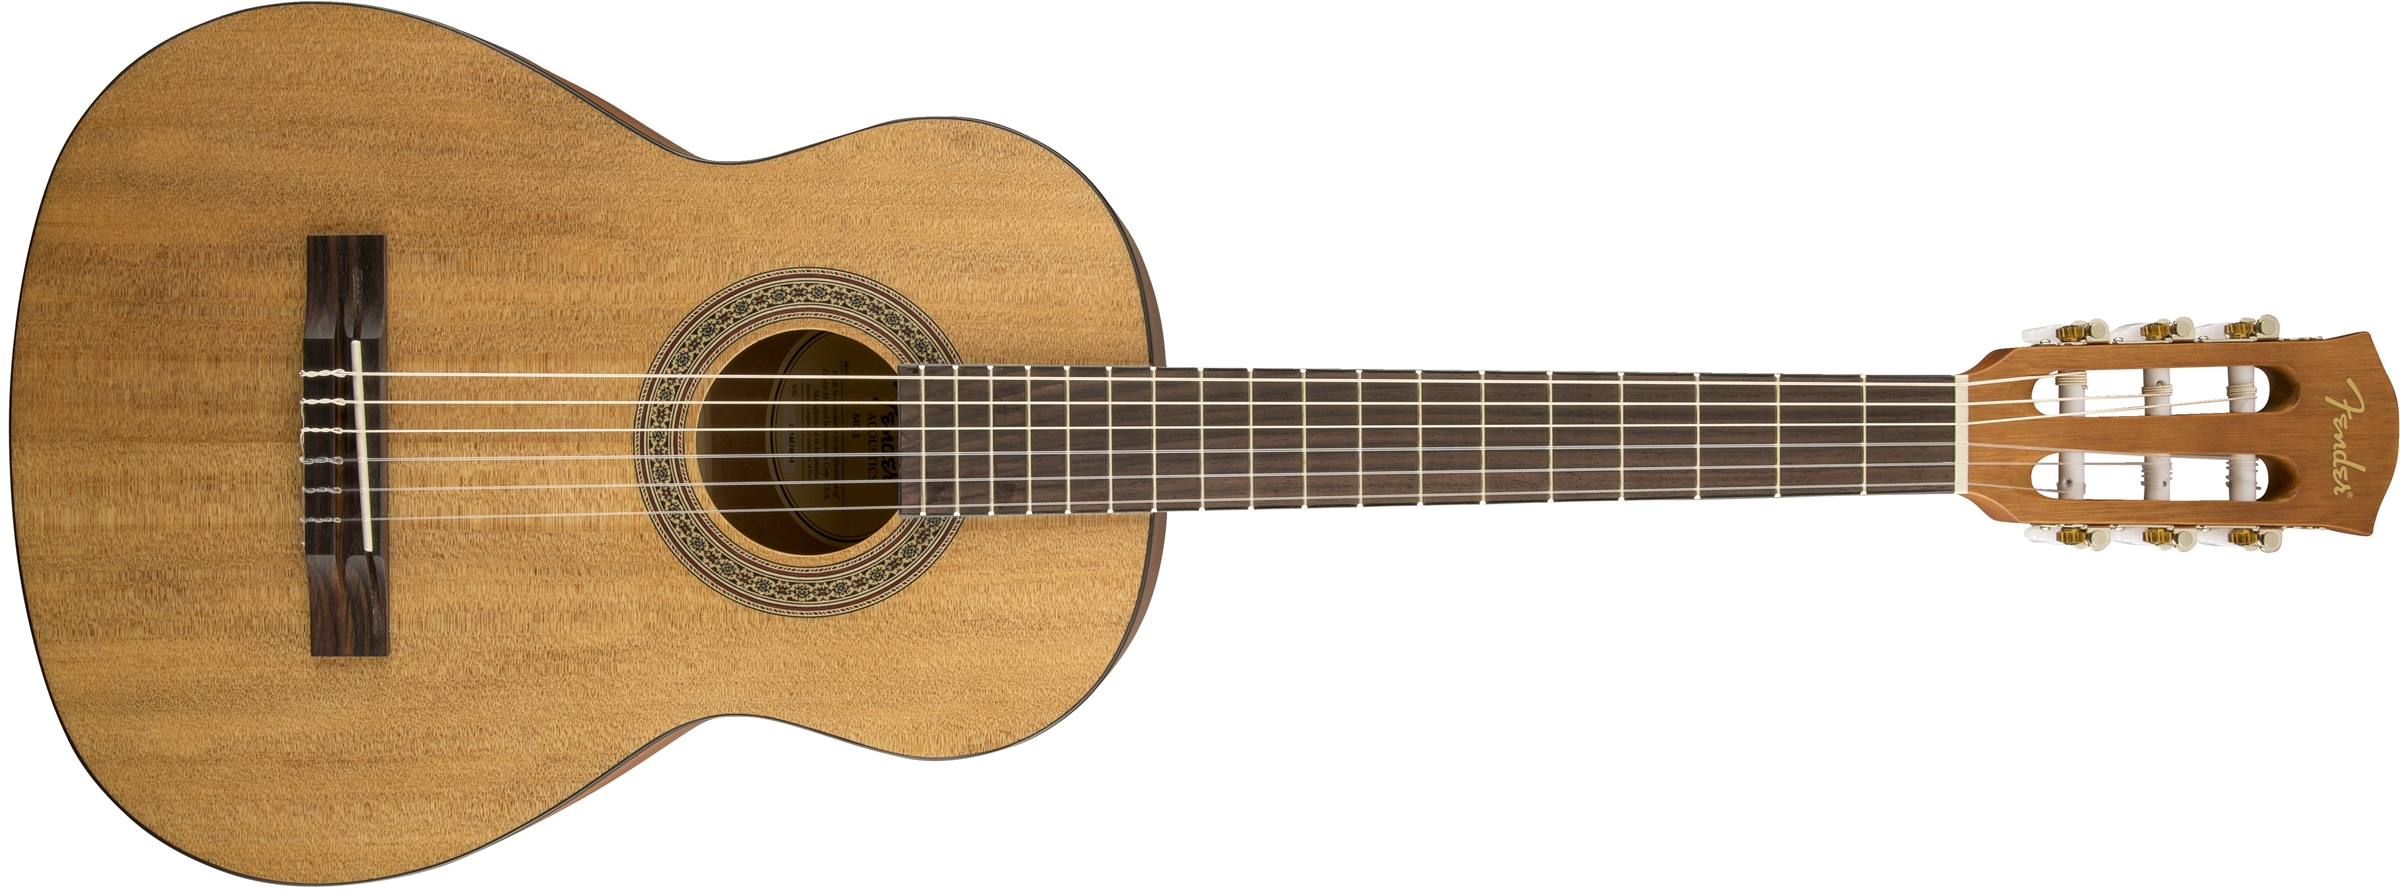 mc 1 3 4 nylon fender acoustic guitars. Black Bedroom Furniture Sets. Home Design Ideas